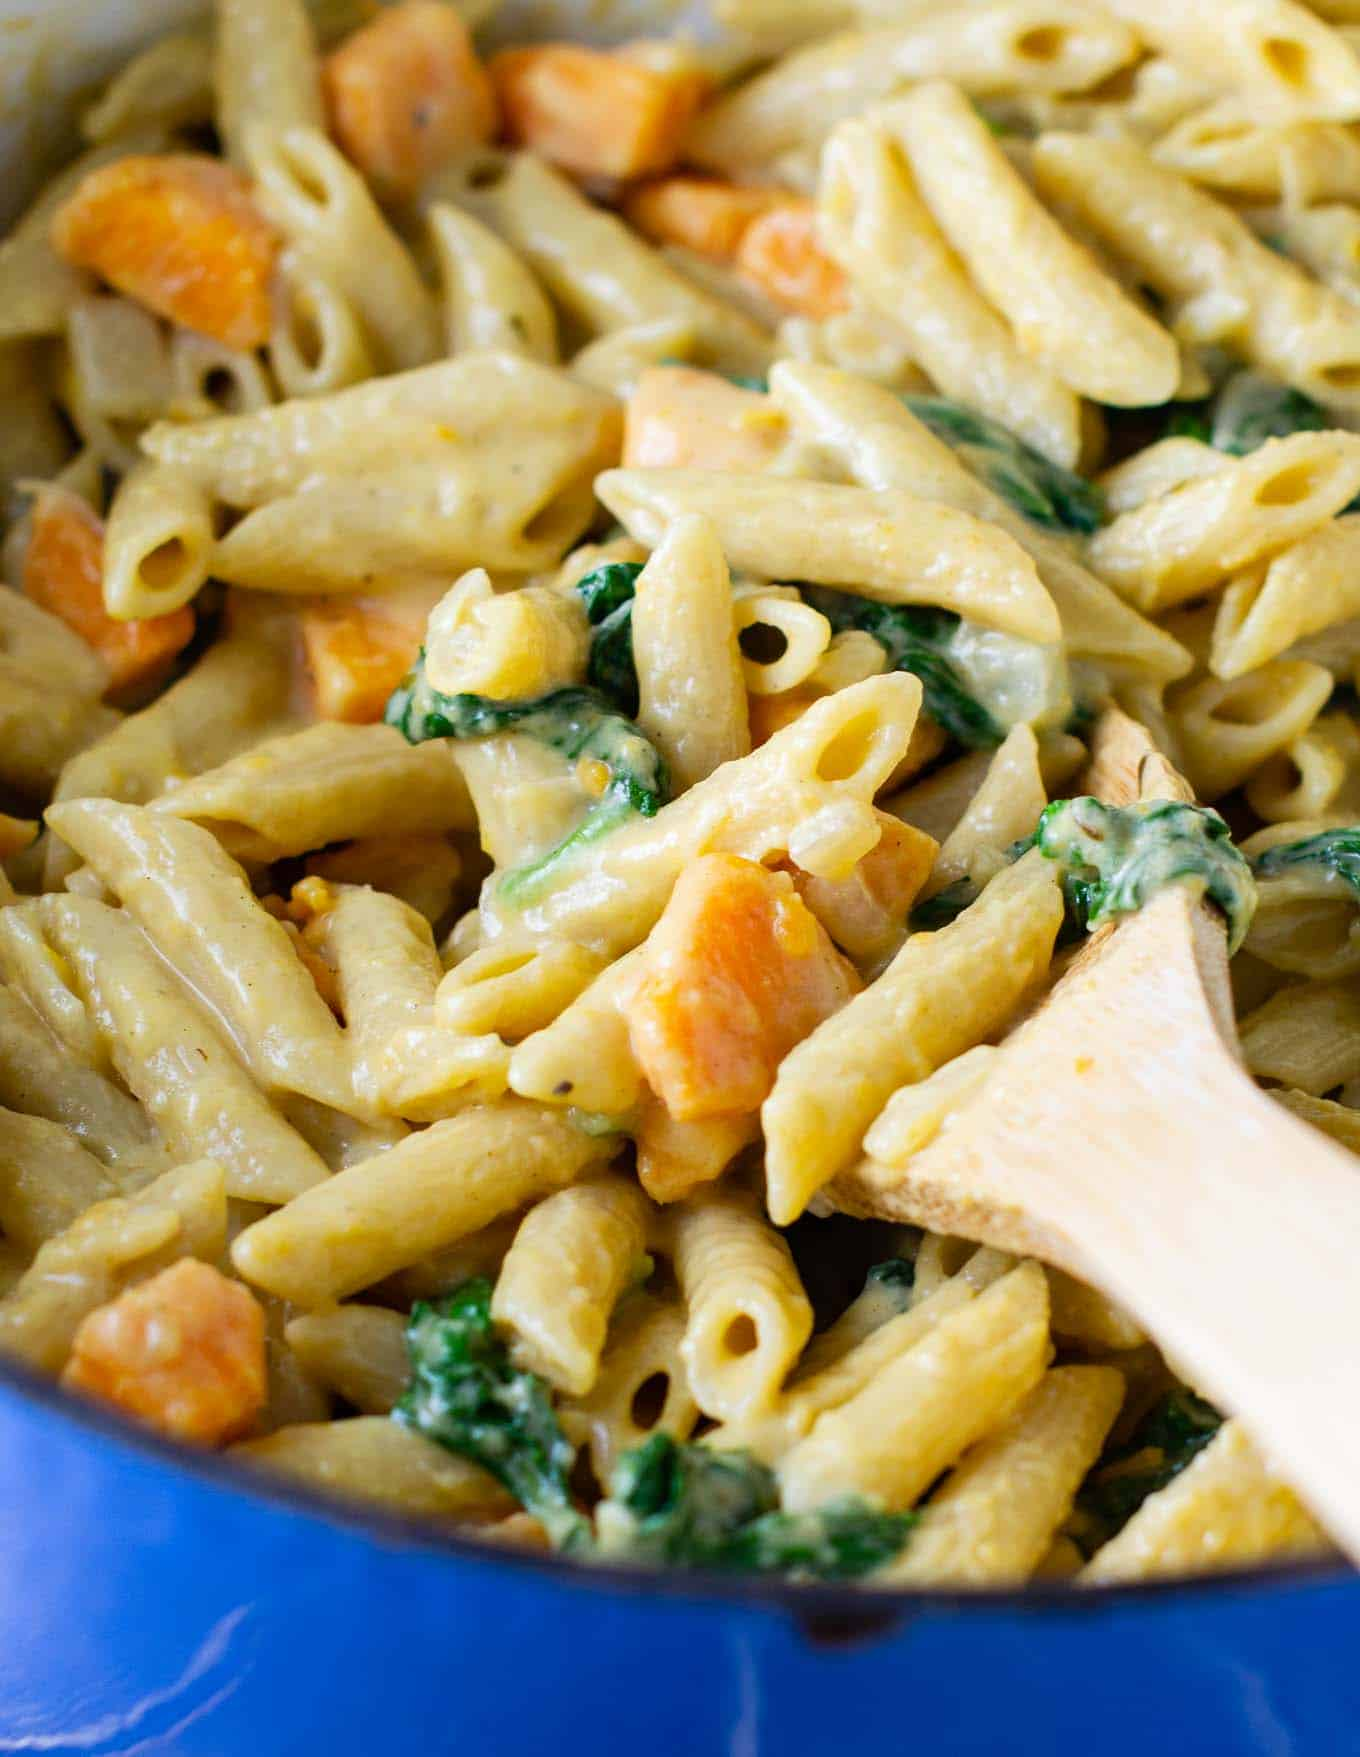 olive garden style pasta recipe